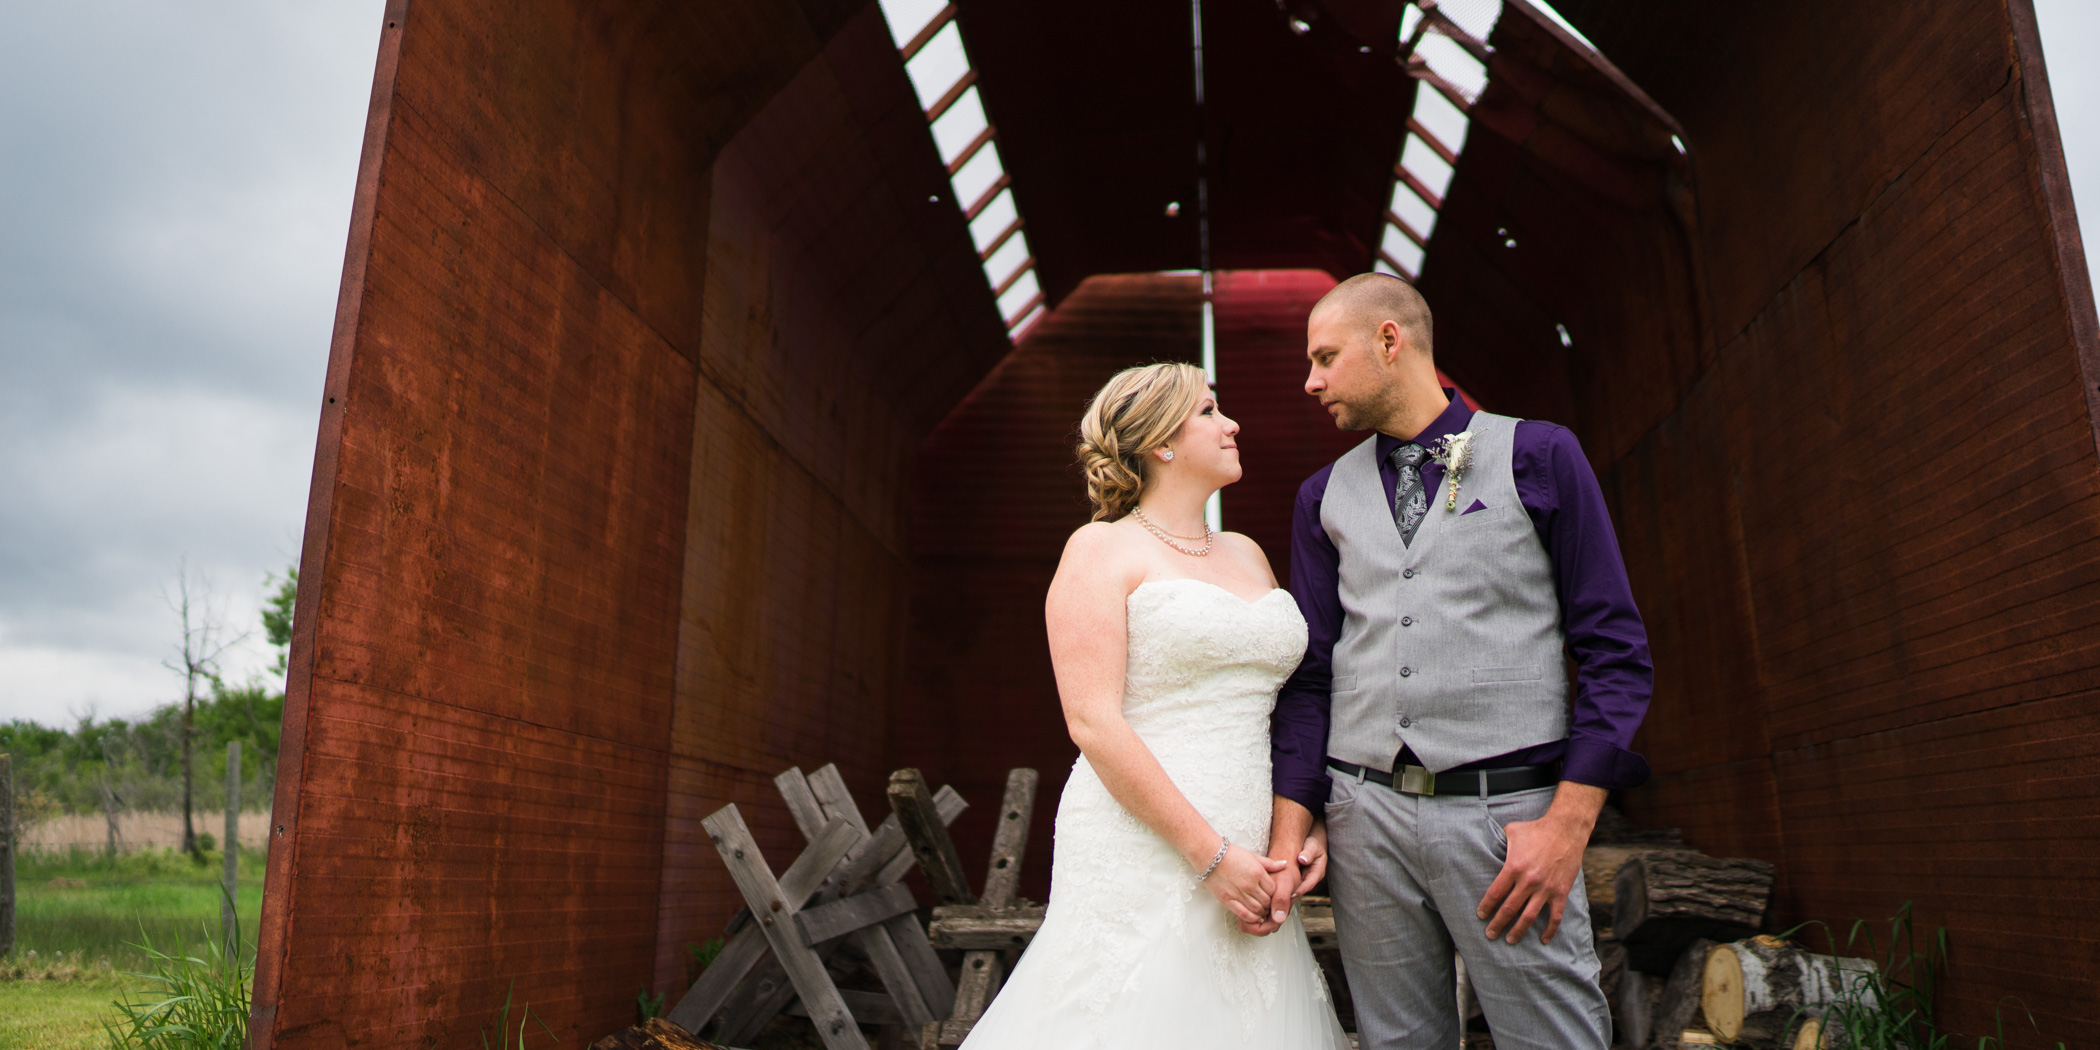 COJO Photo - Whitney and Steve - Wedding-393.jpg